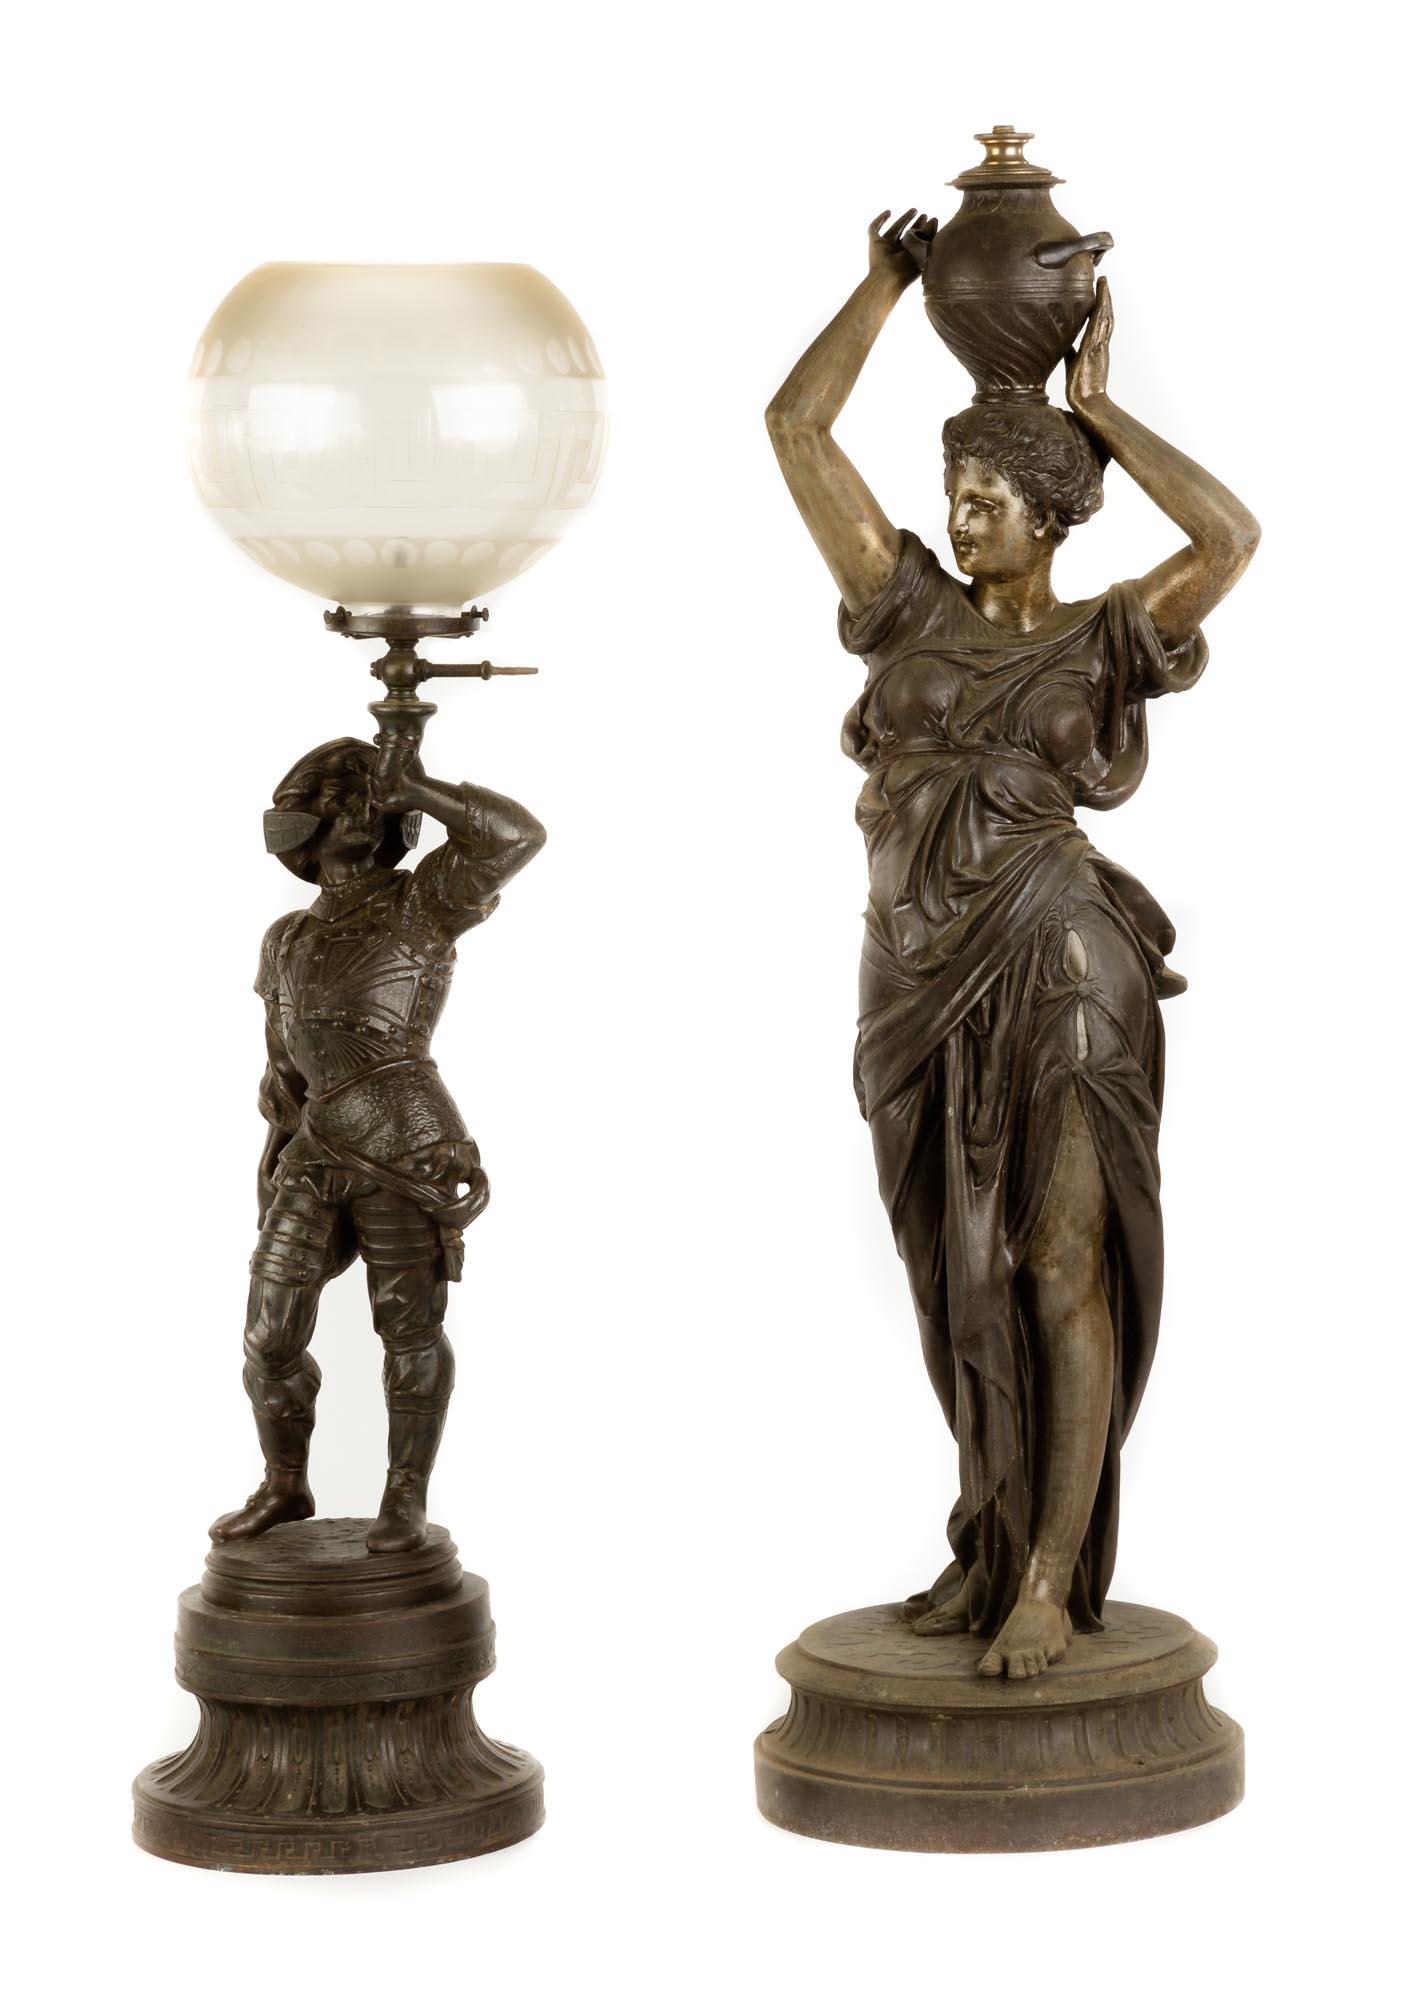 Lot 206 - Figural Patinaed Metal Newel Post Lamp. Medium size Cavalier gas newel post lamp Attributed to